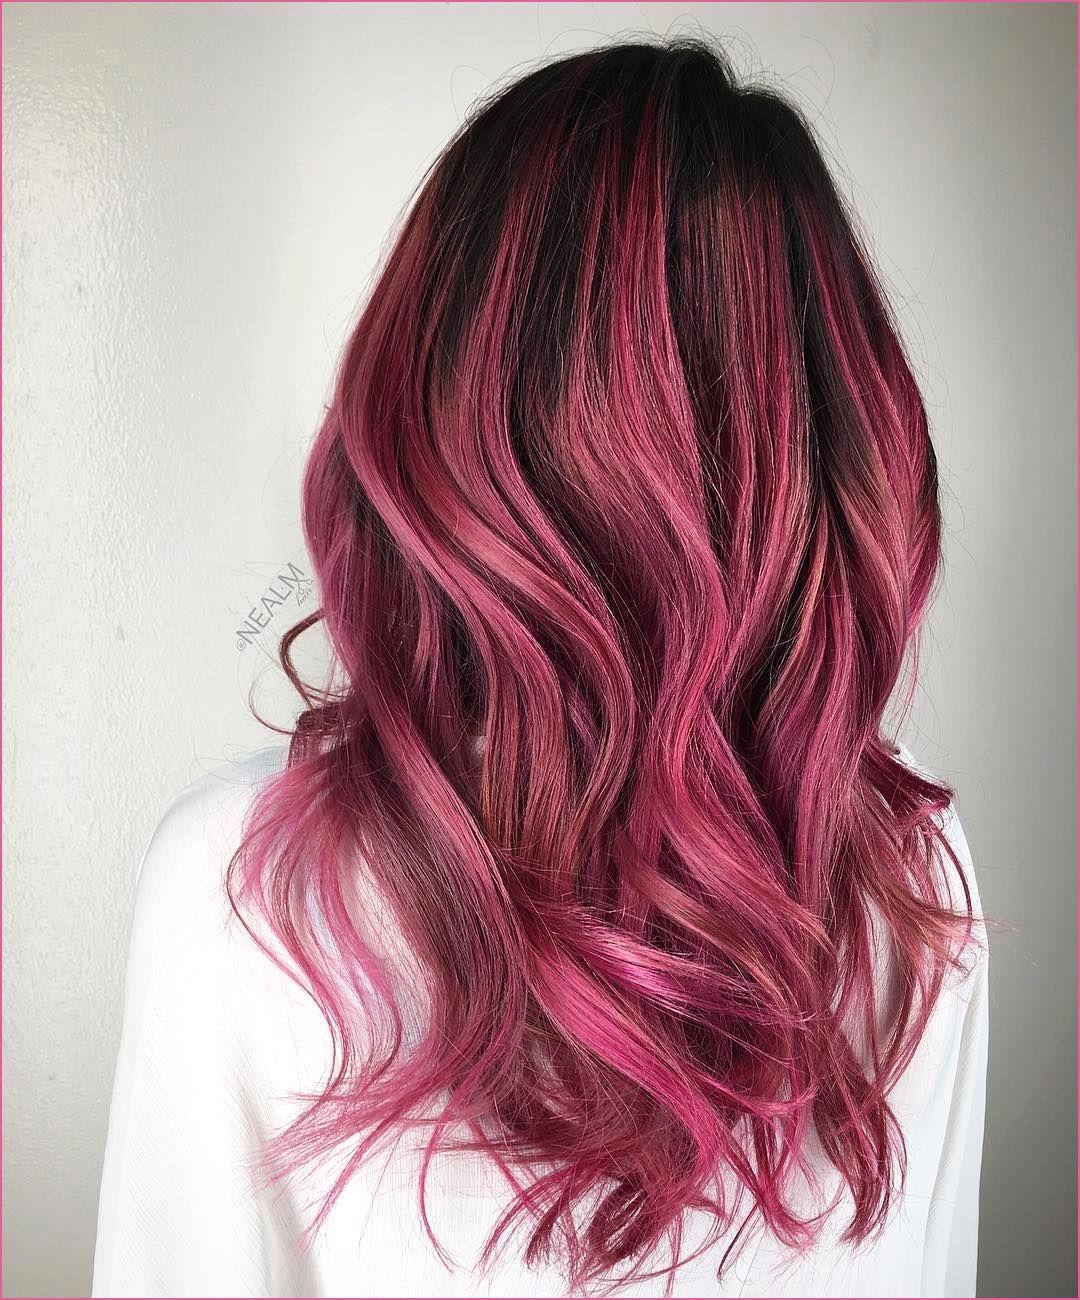 Wild Orchid Hair Color In 2020 Dark Pink Hair Hair Styles Brunette Hair Color